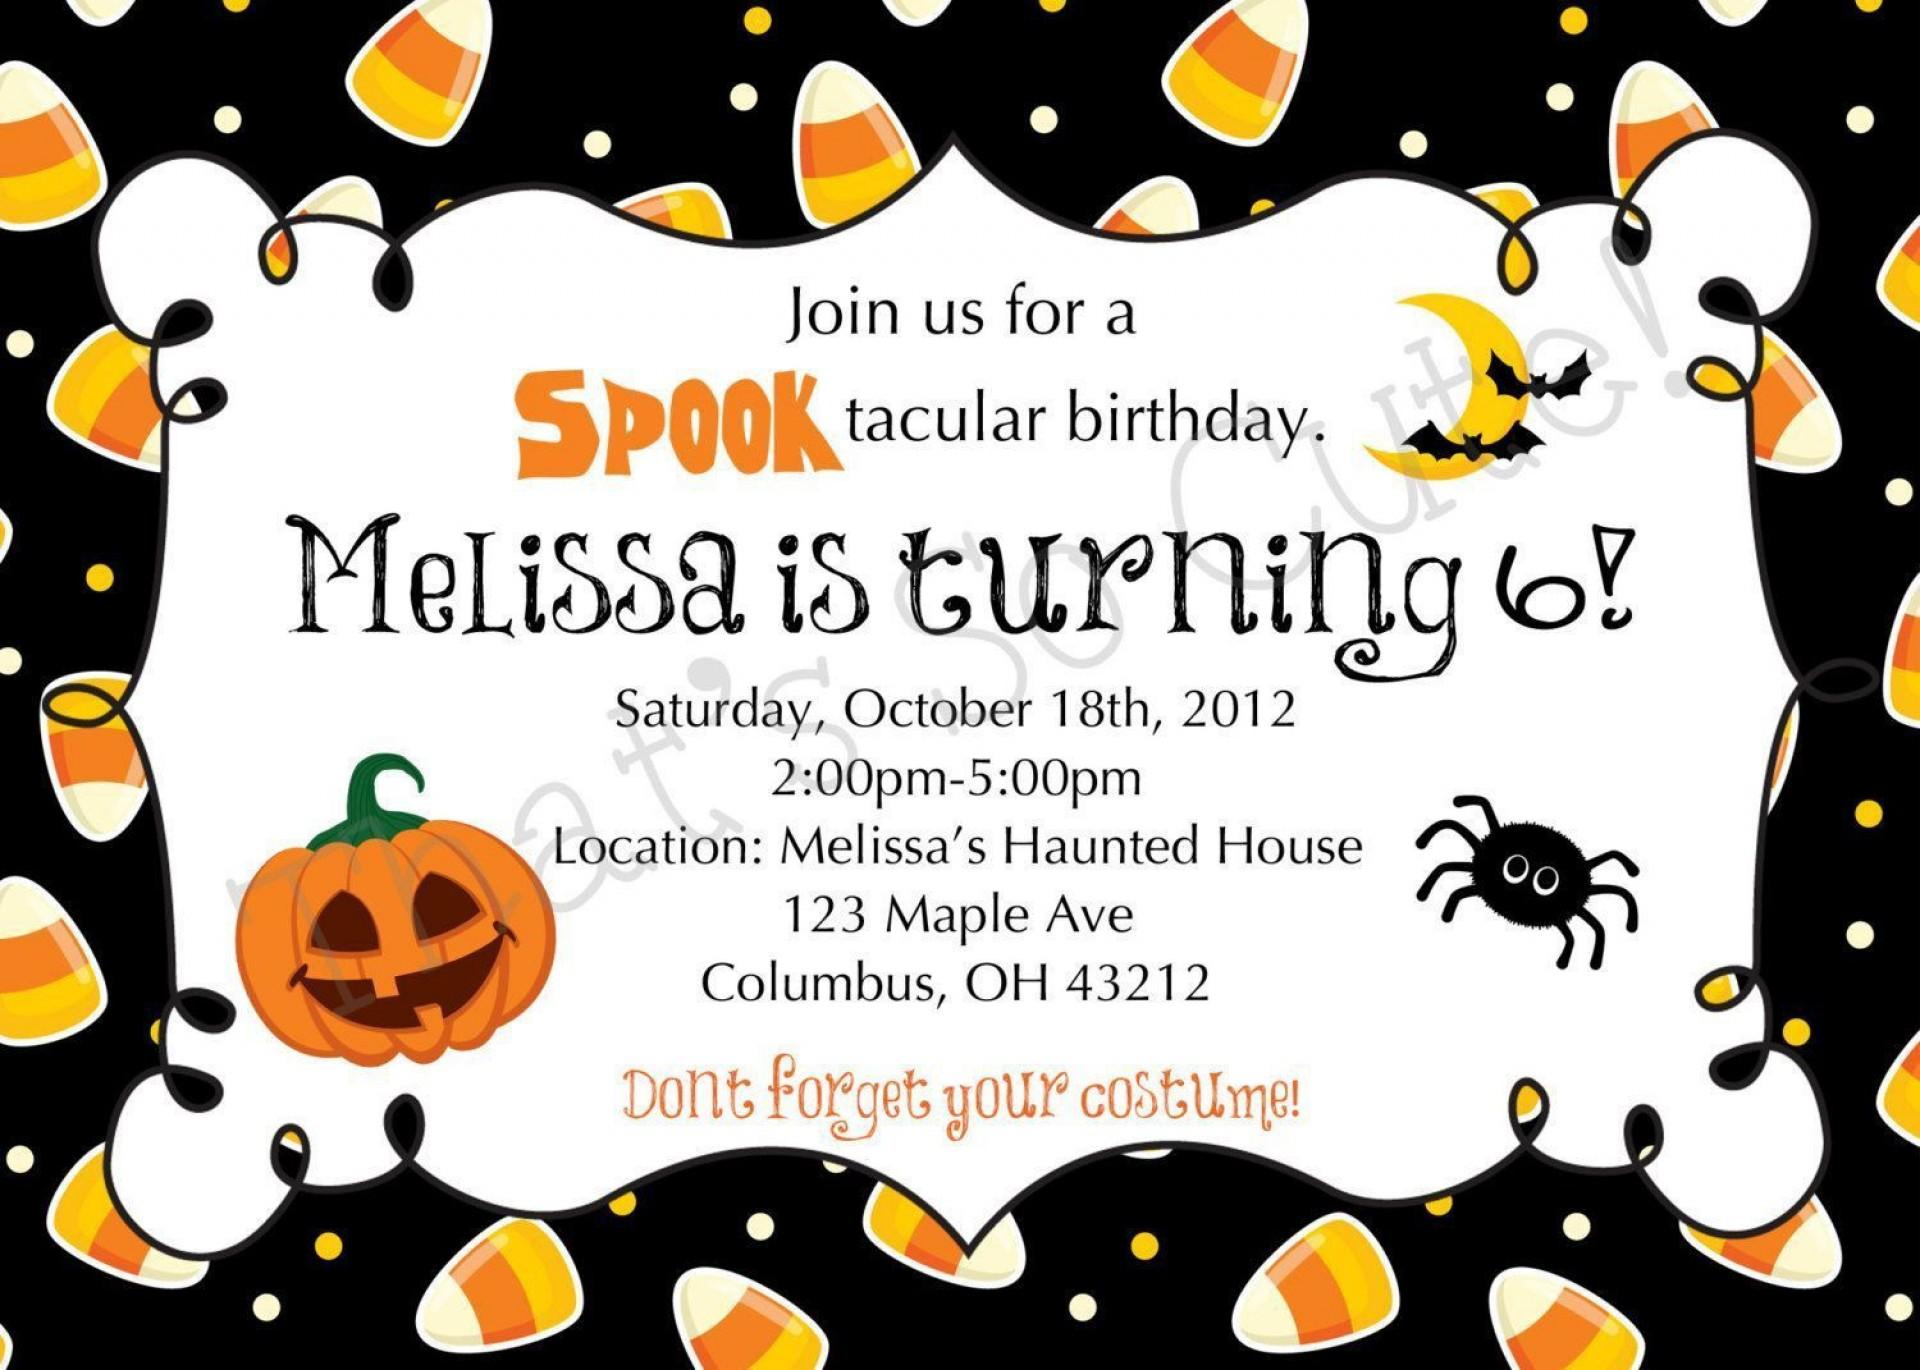 001 Shocking Halloween Invitation Template Microsoft Word Photo  Birthday Free1920